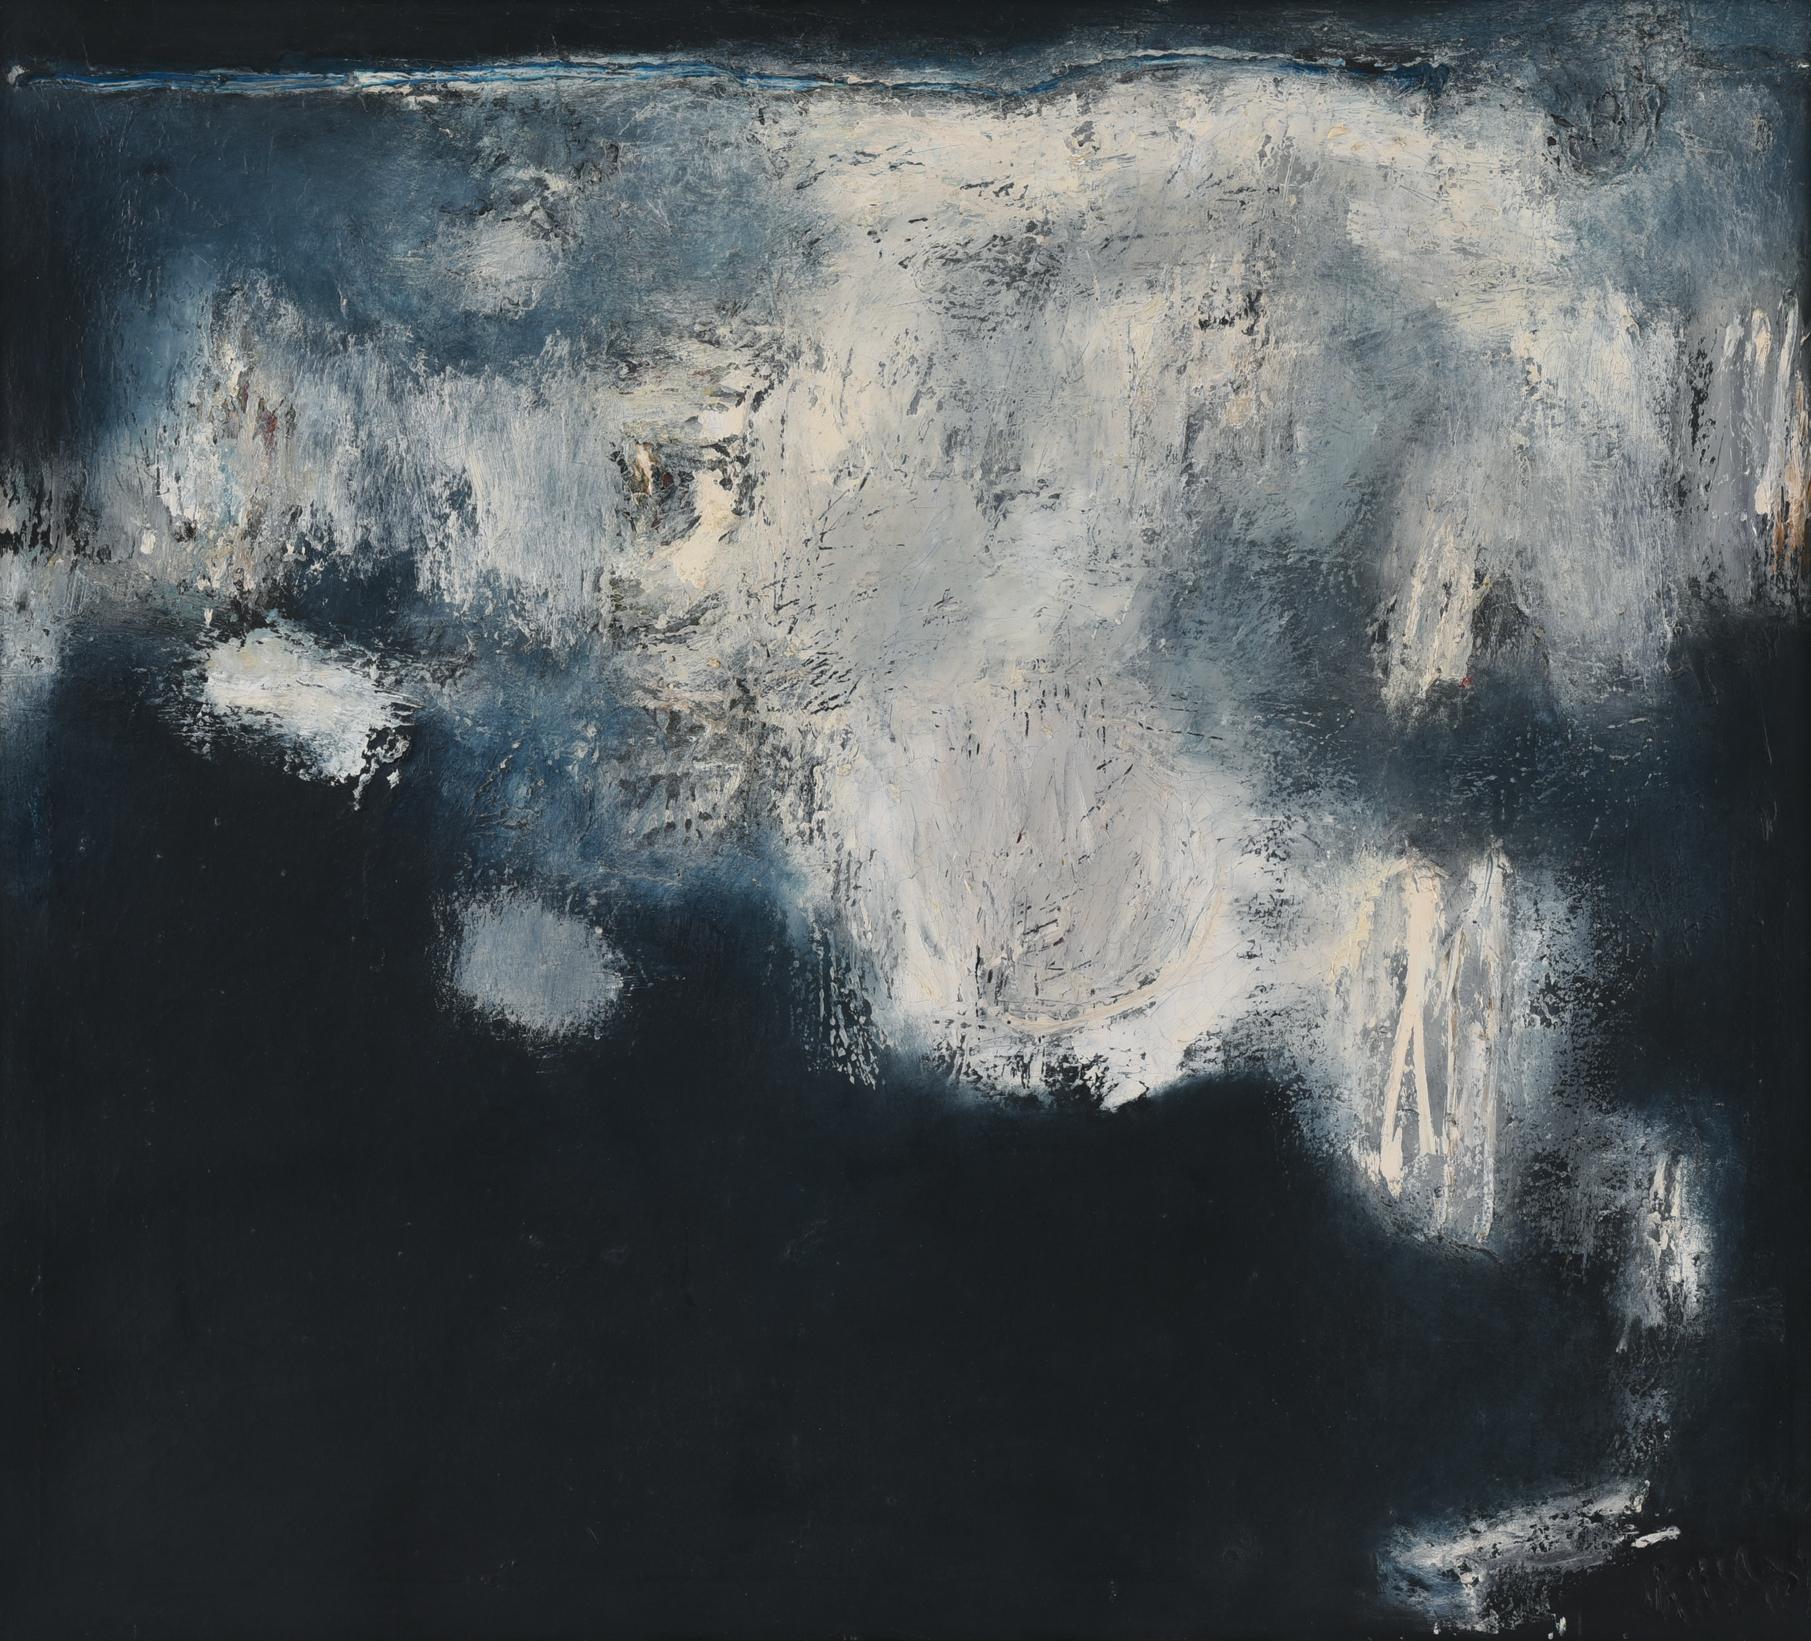 Srihadi Soedarsono, Rock On the Shore, oil on canvas, 89 x 99 cm, 1966